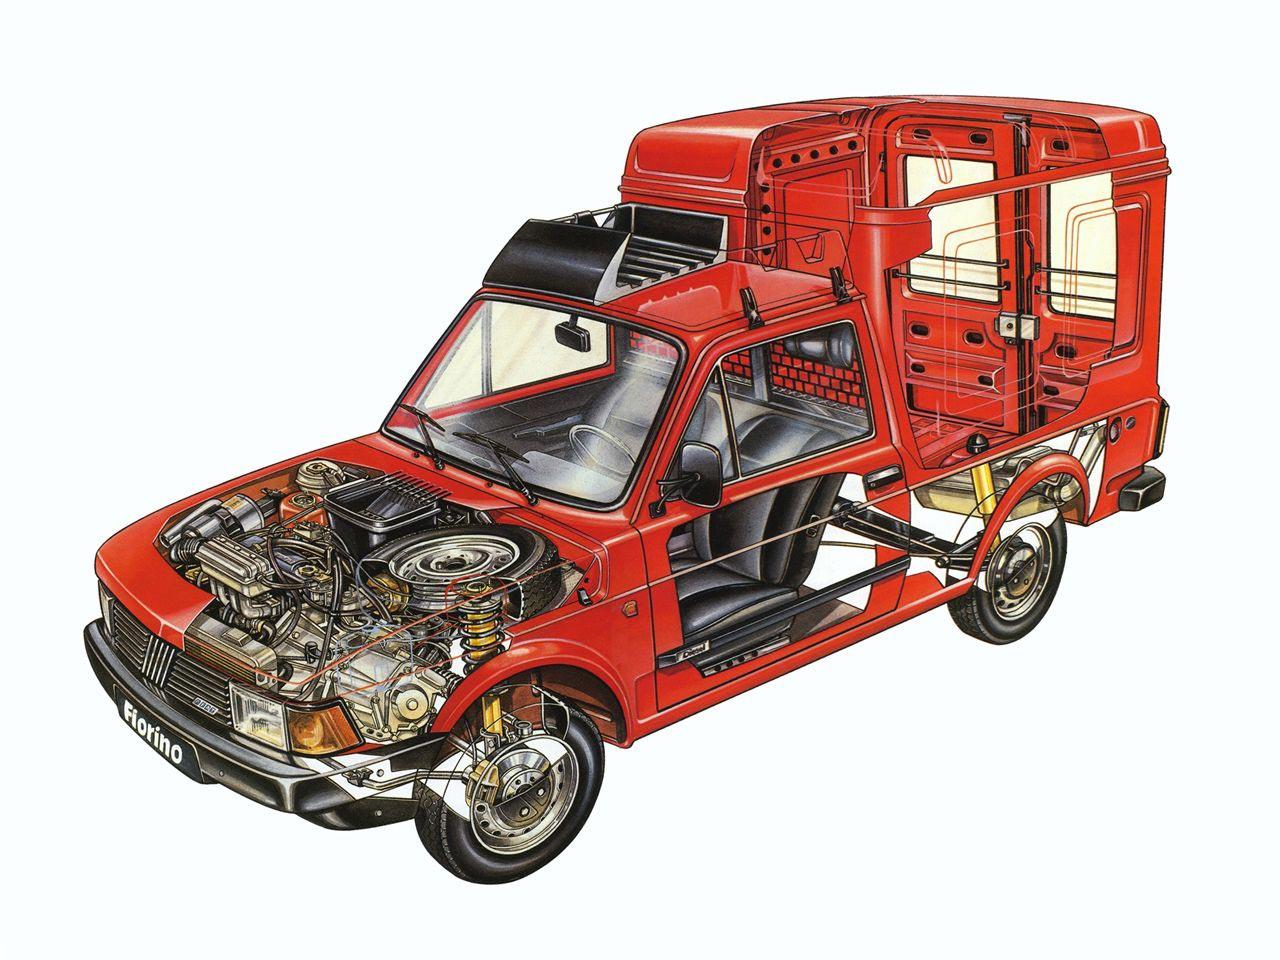 Fiat Fiorino cutaway drawing